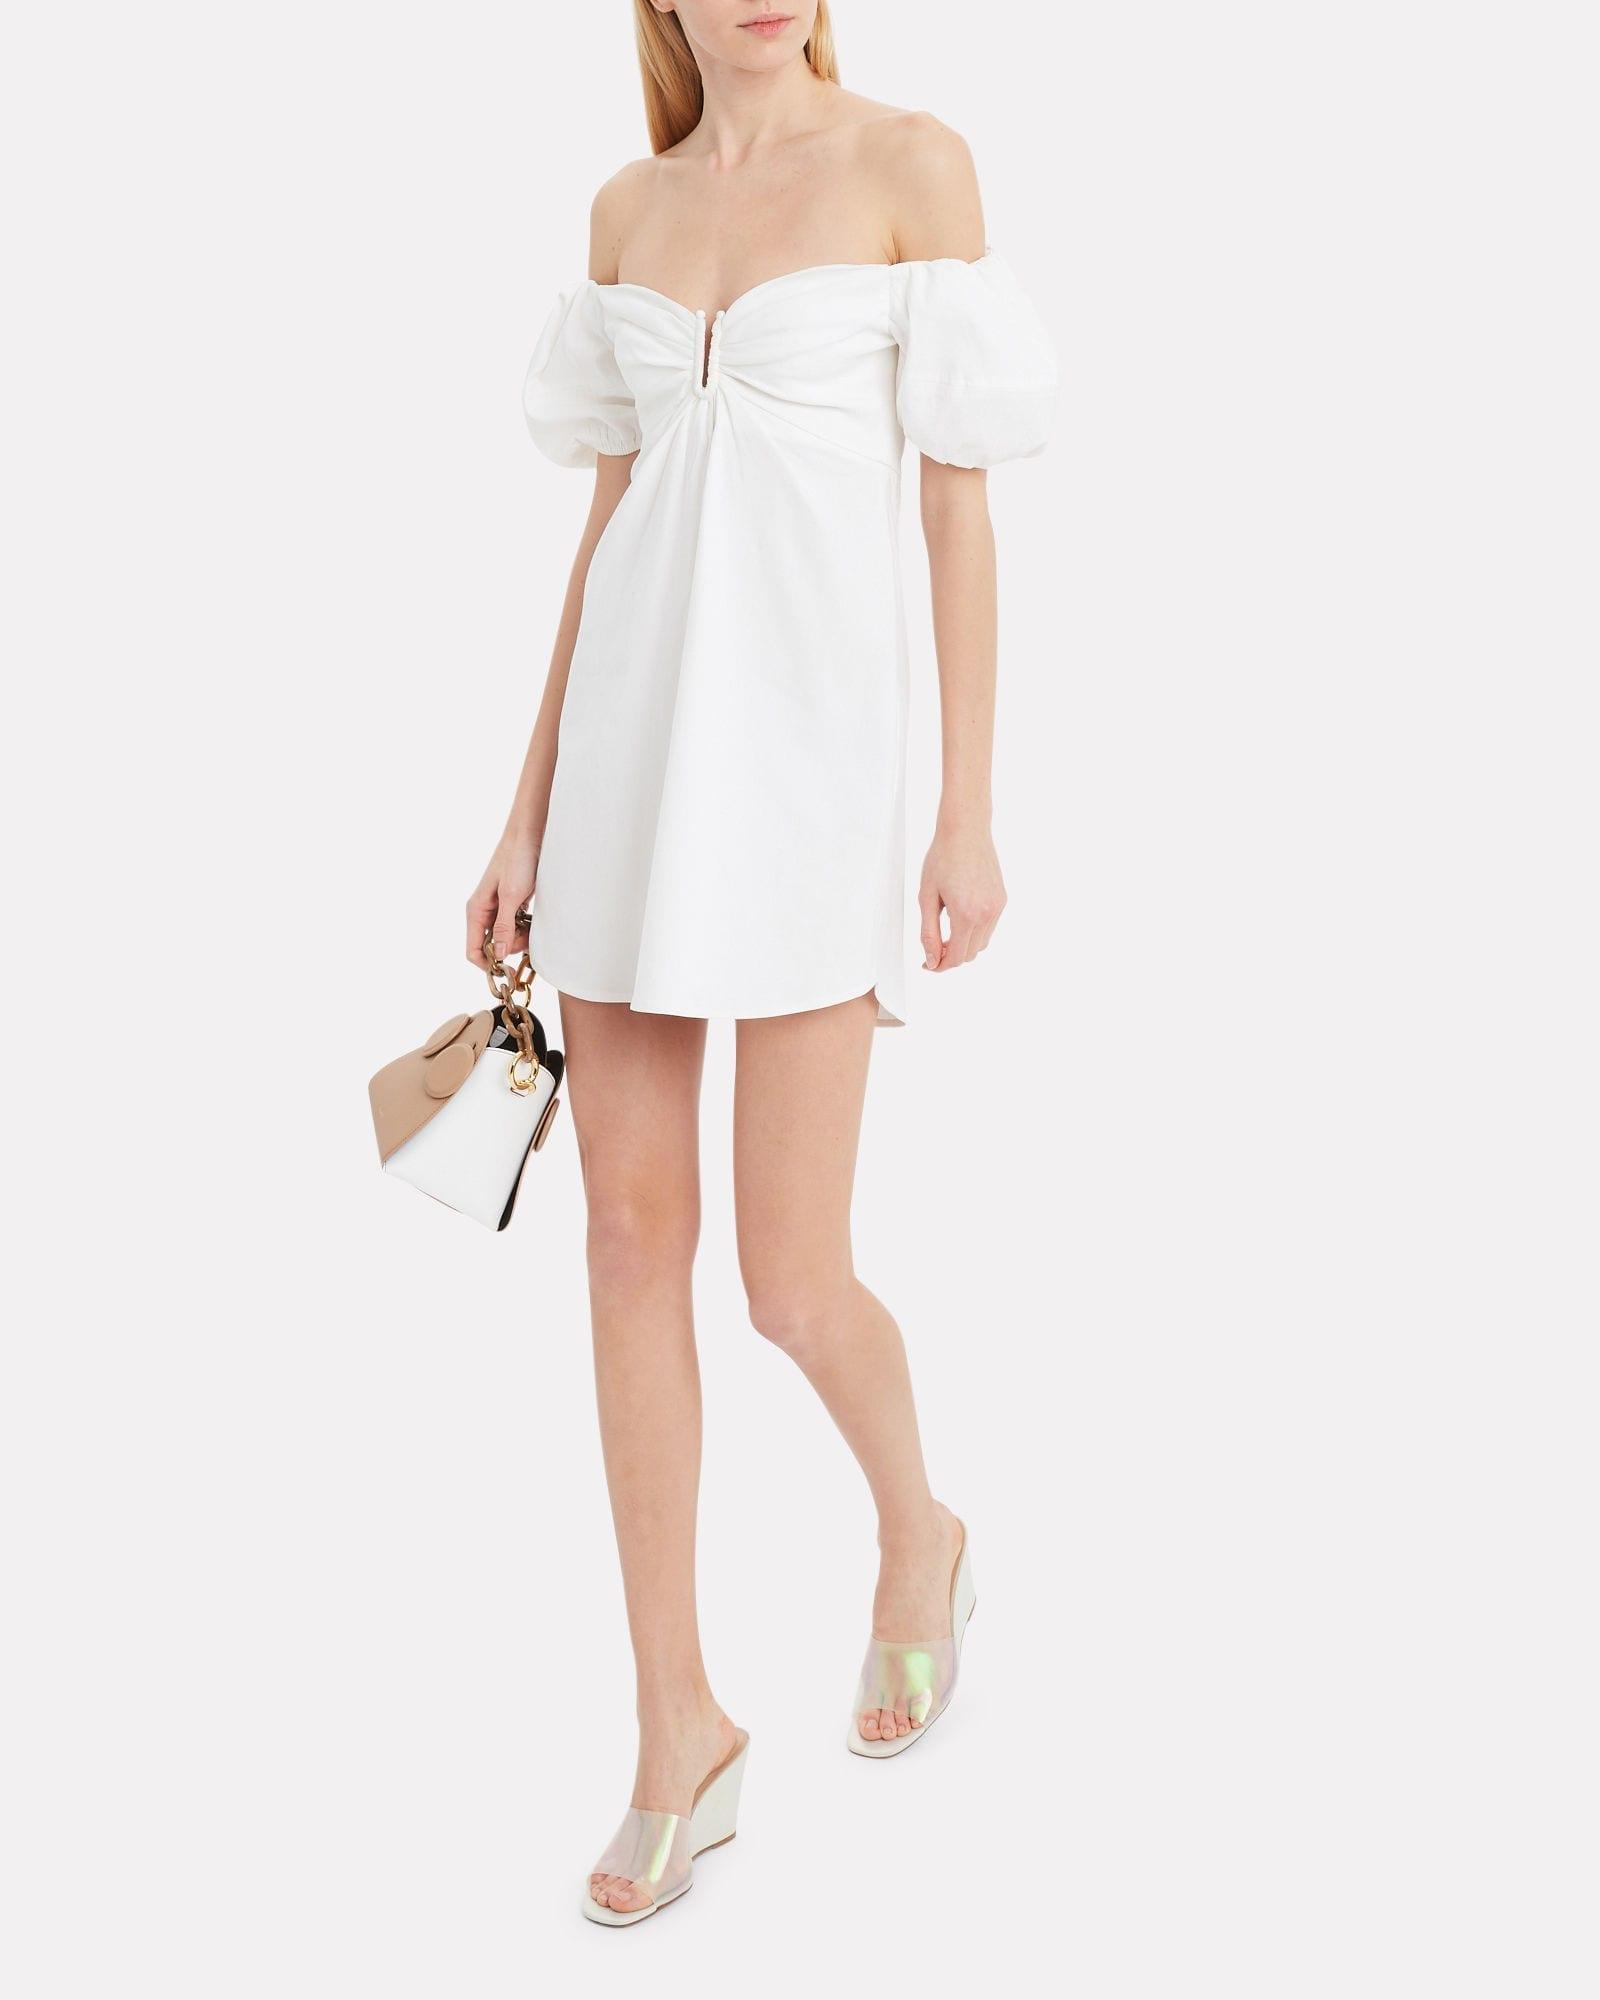 020538b546b Strapless Dresses - We Select Dresses